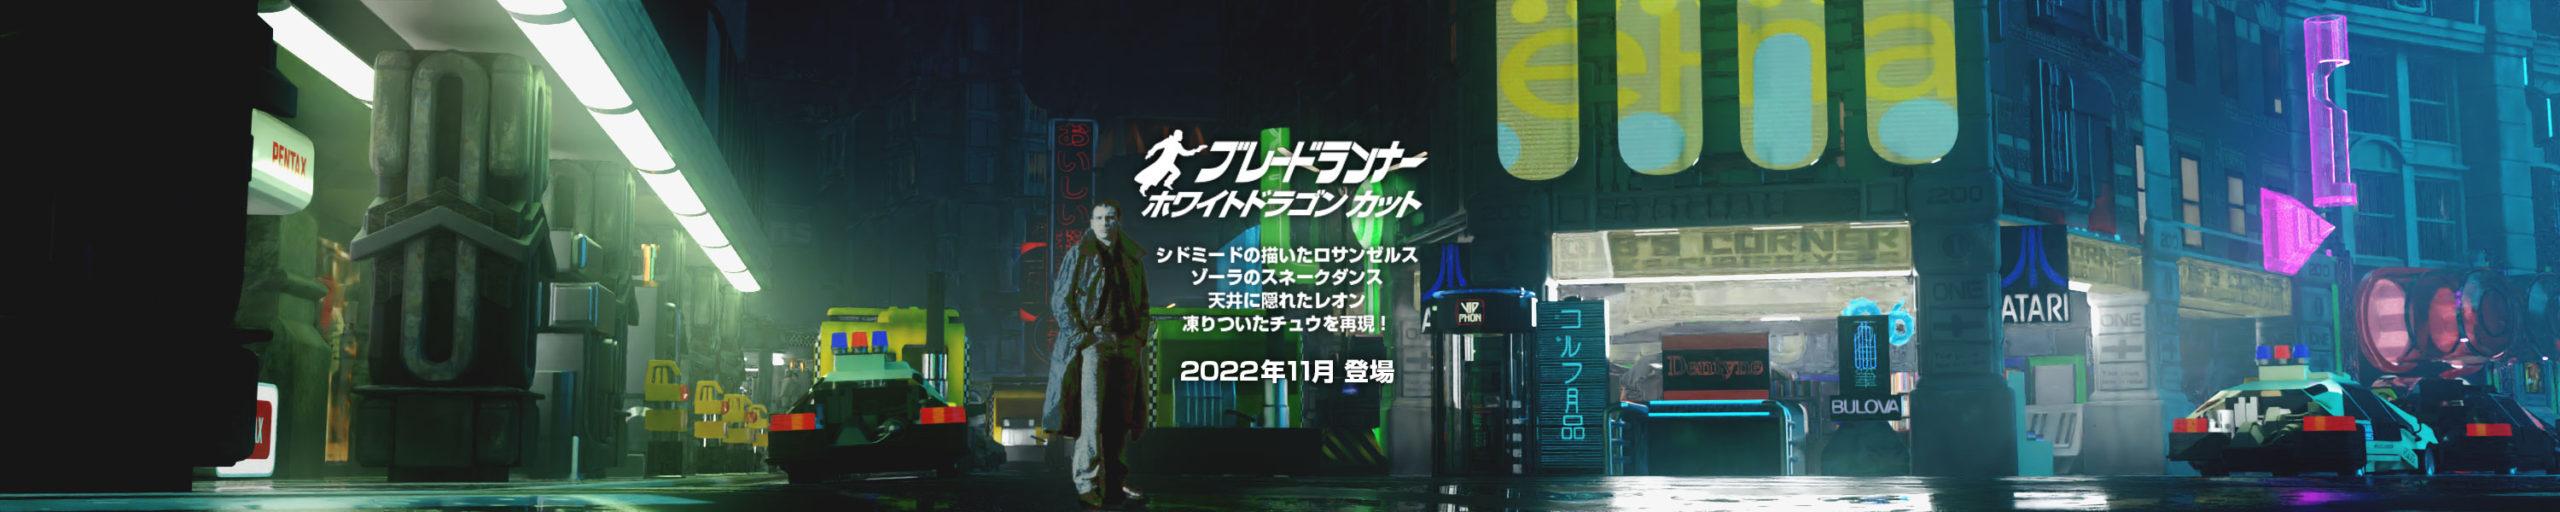 Blade Runner White Dragon Cut